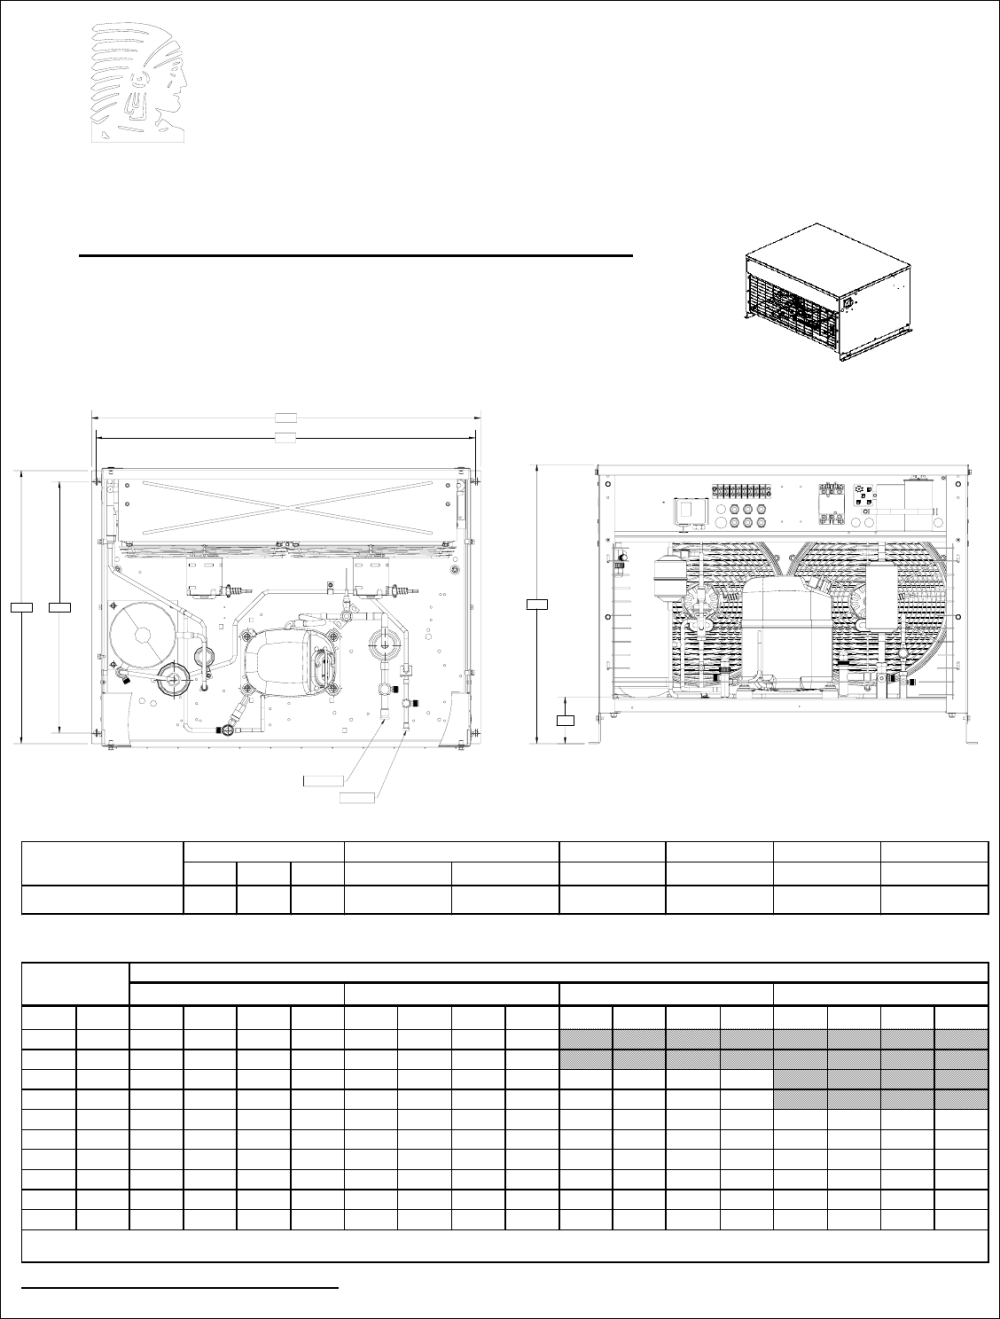 medium resolution of tecumseh engine wiring diagram electric mixcraft 5 registration code